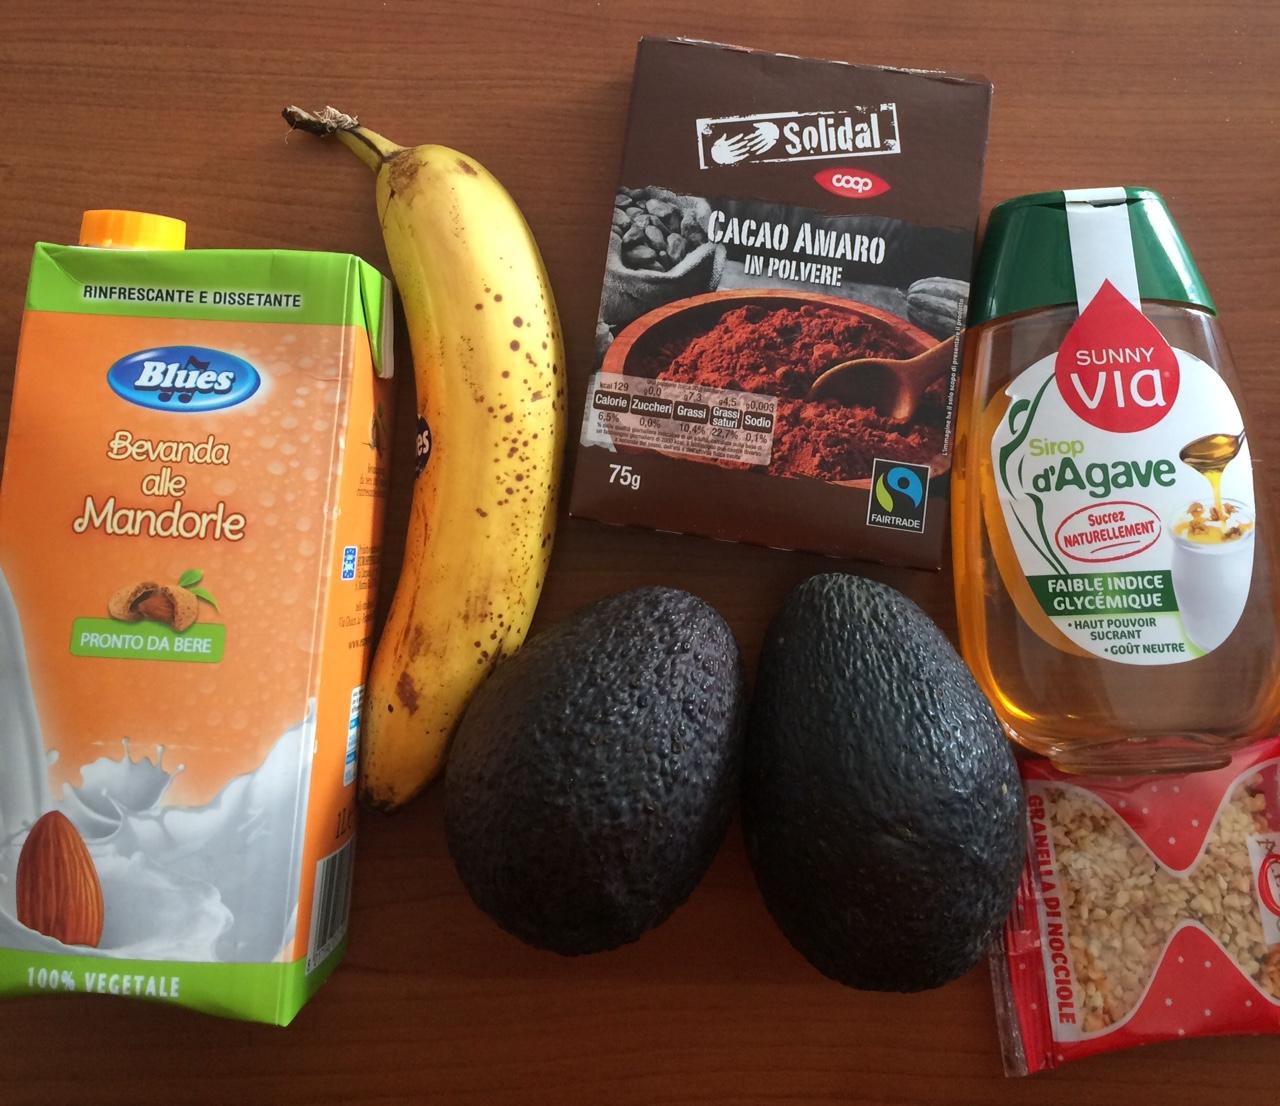 ricettevegan.org - mousse di avocado e cacao - ingredienti